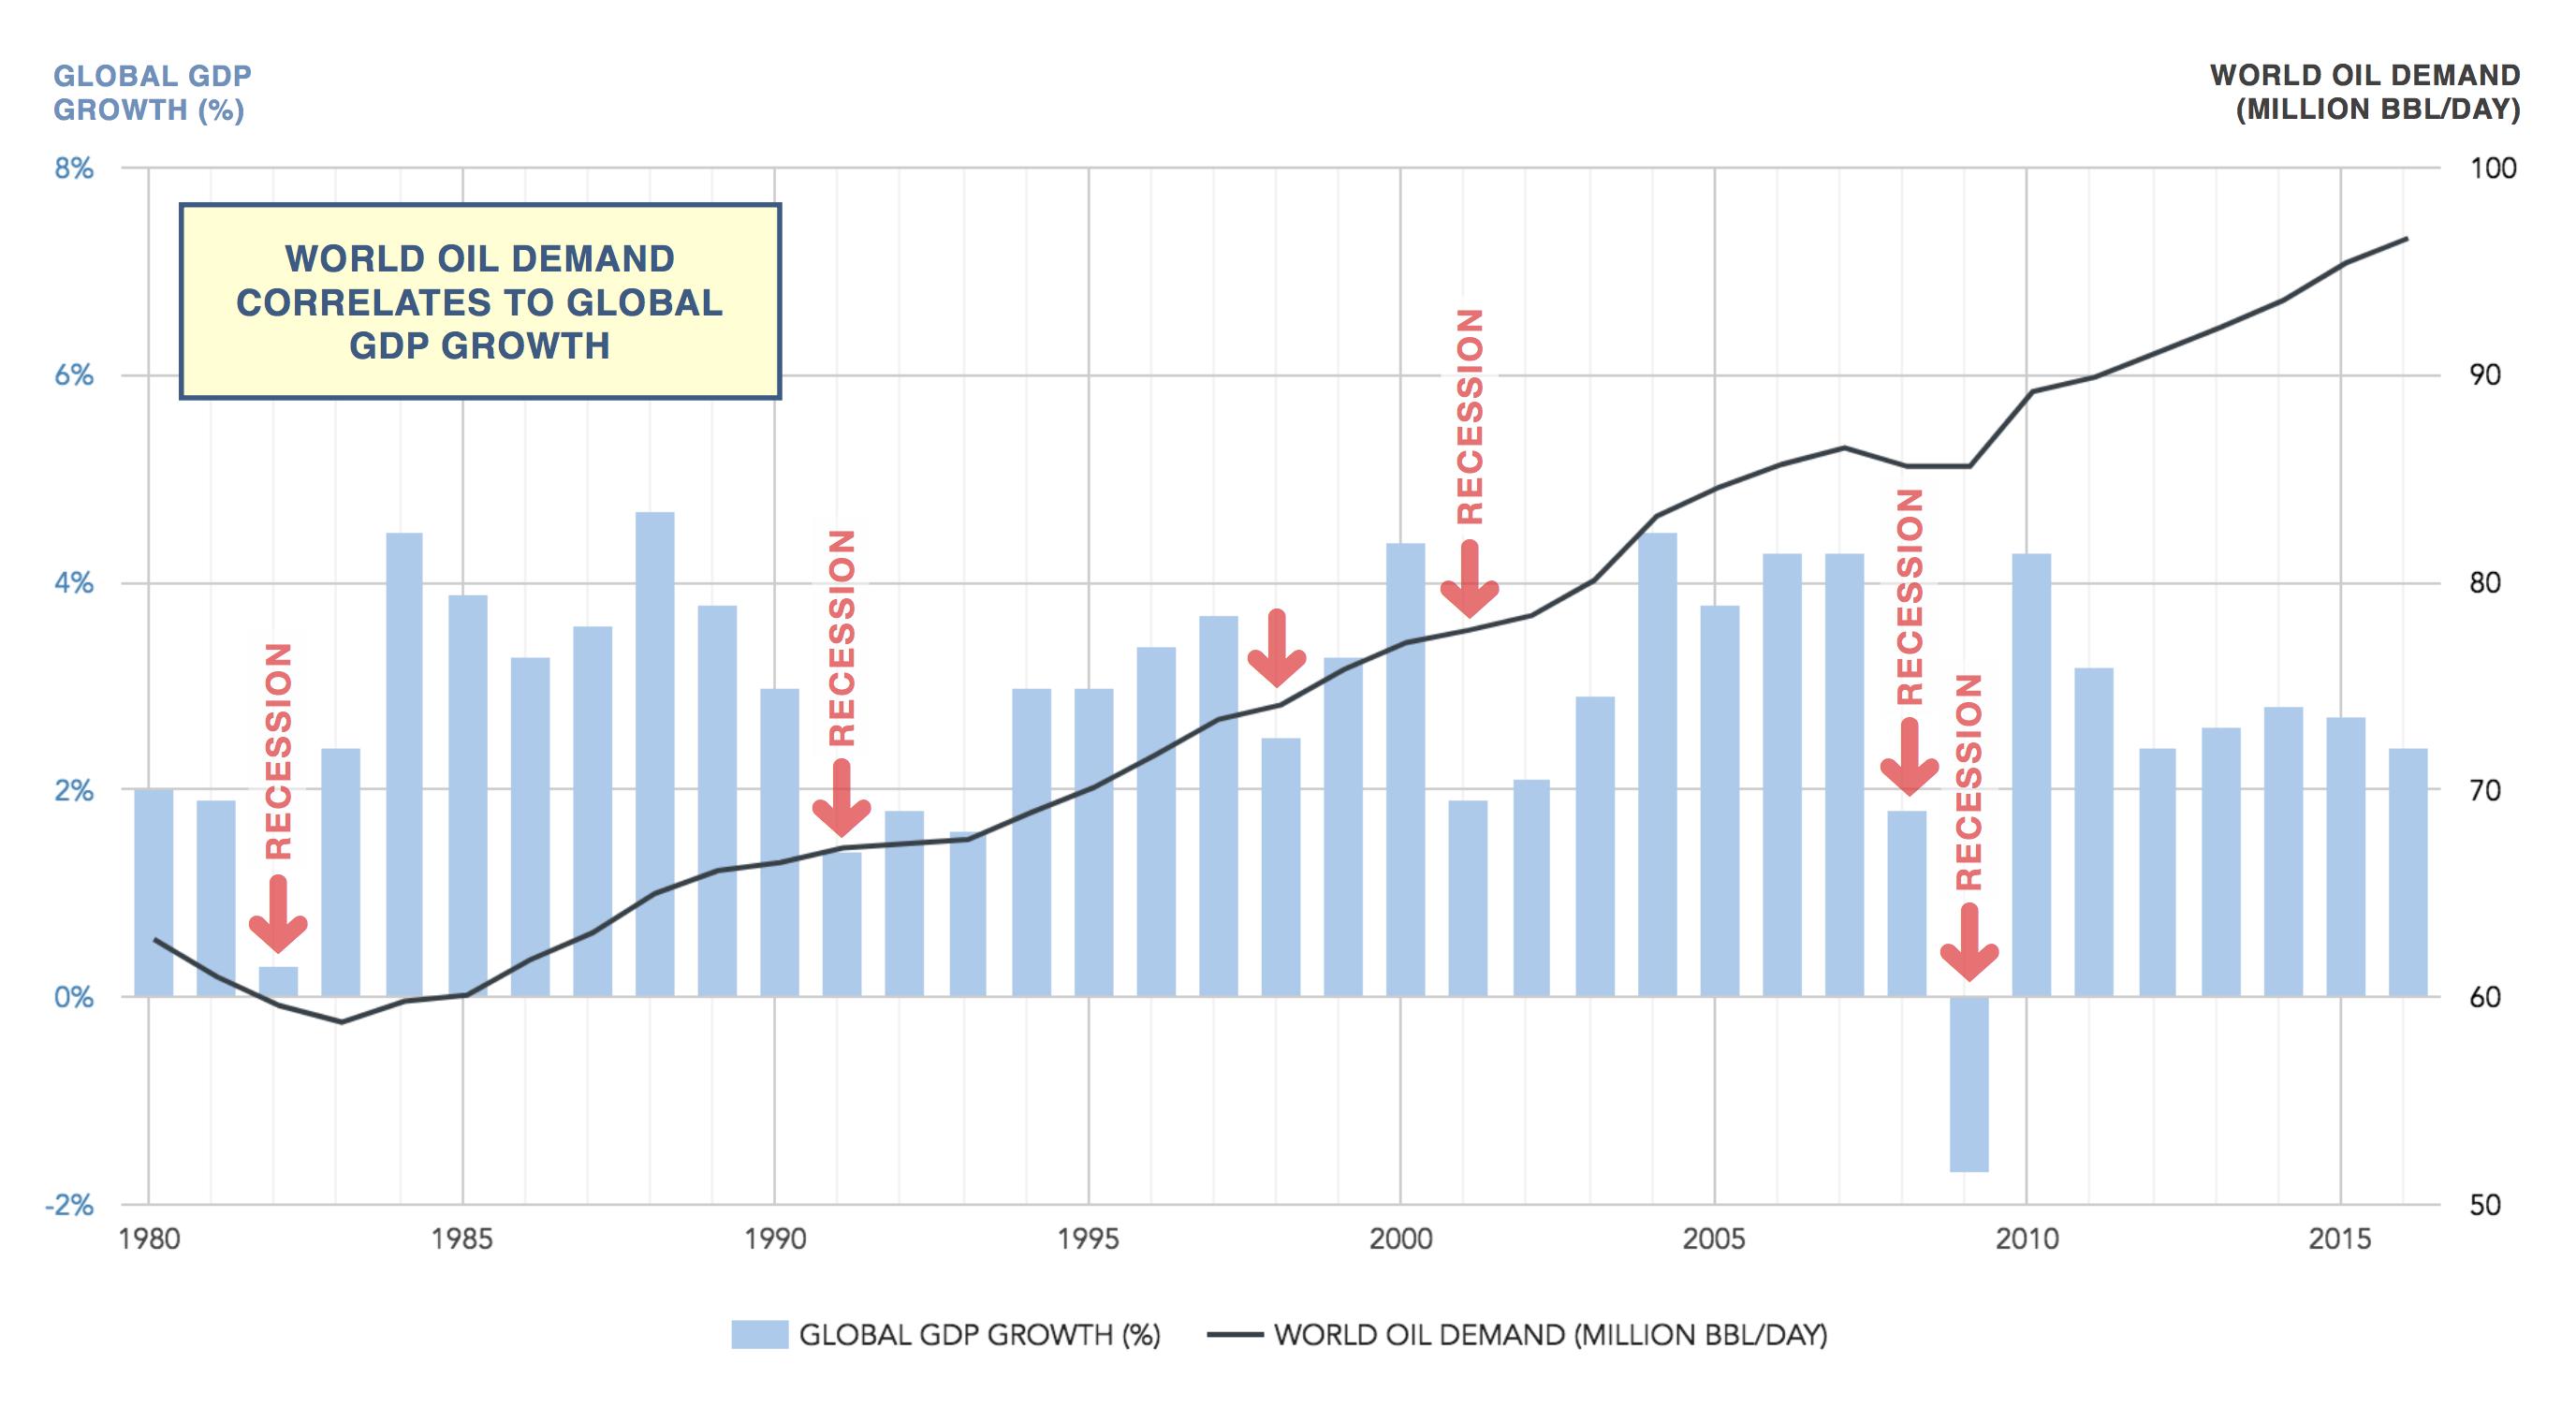 world oil demand versus global GDP